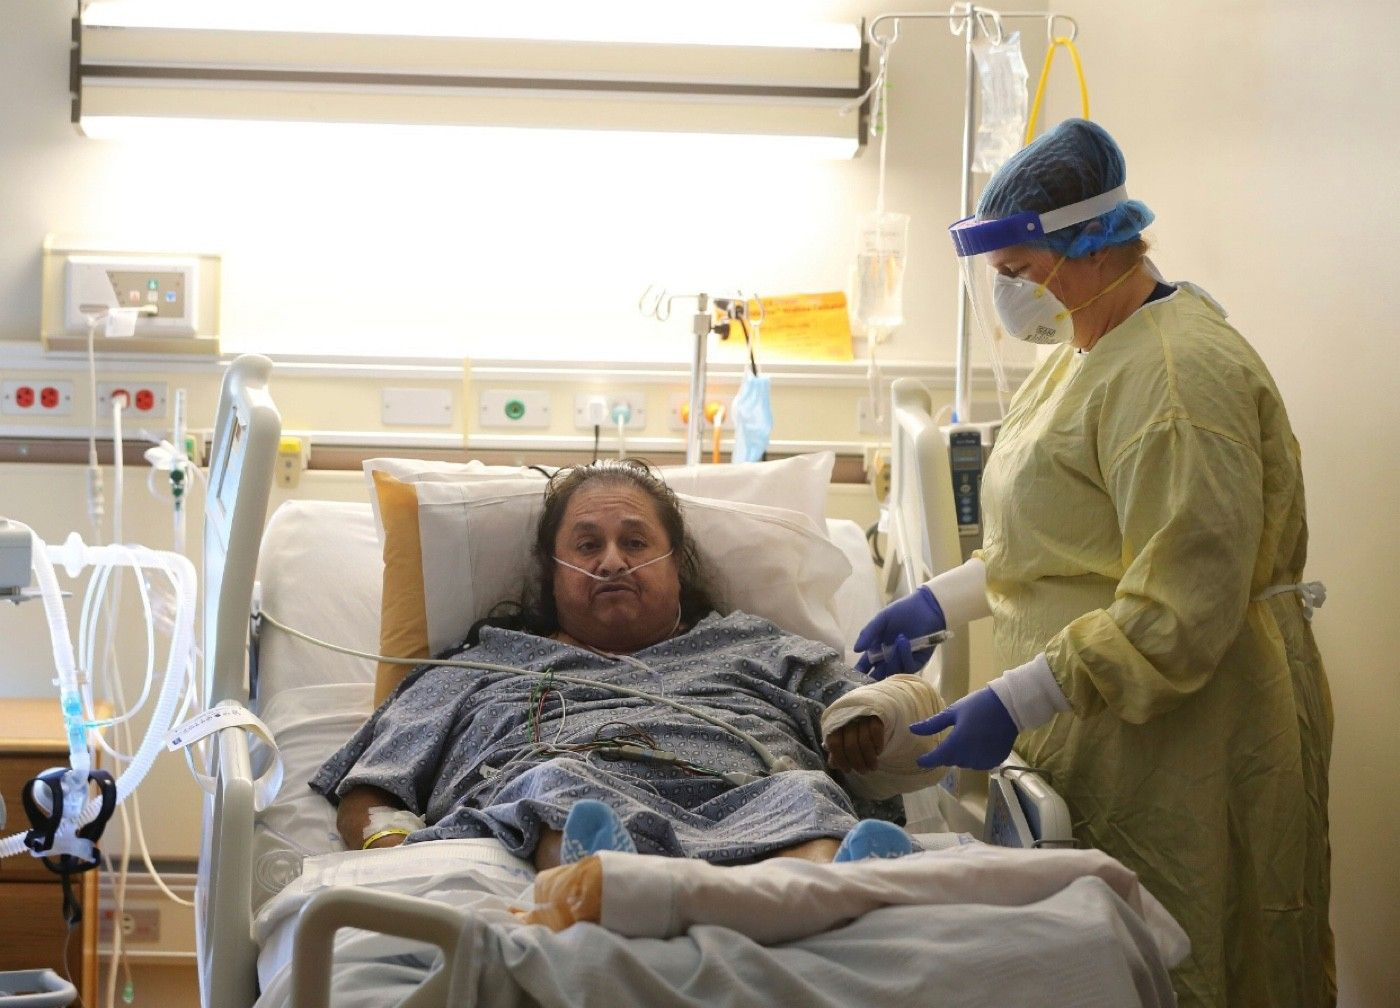 Memorial Hospital nurse Angela Bilyeu flushes the IV of patient Pedro Cortez in a COVID-19 unit on Friday | Alex Horvath